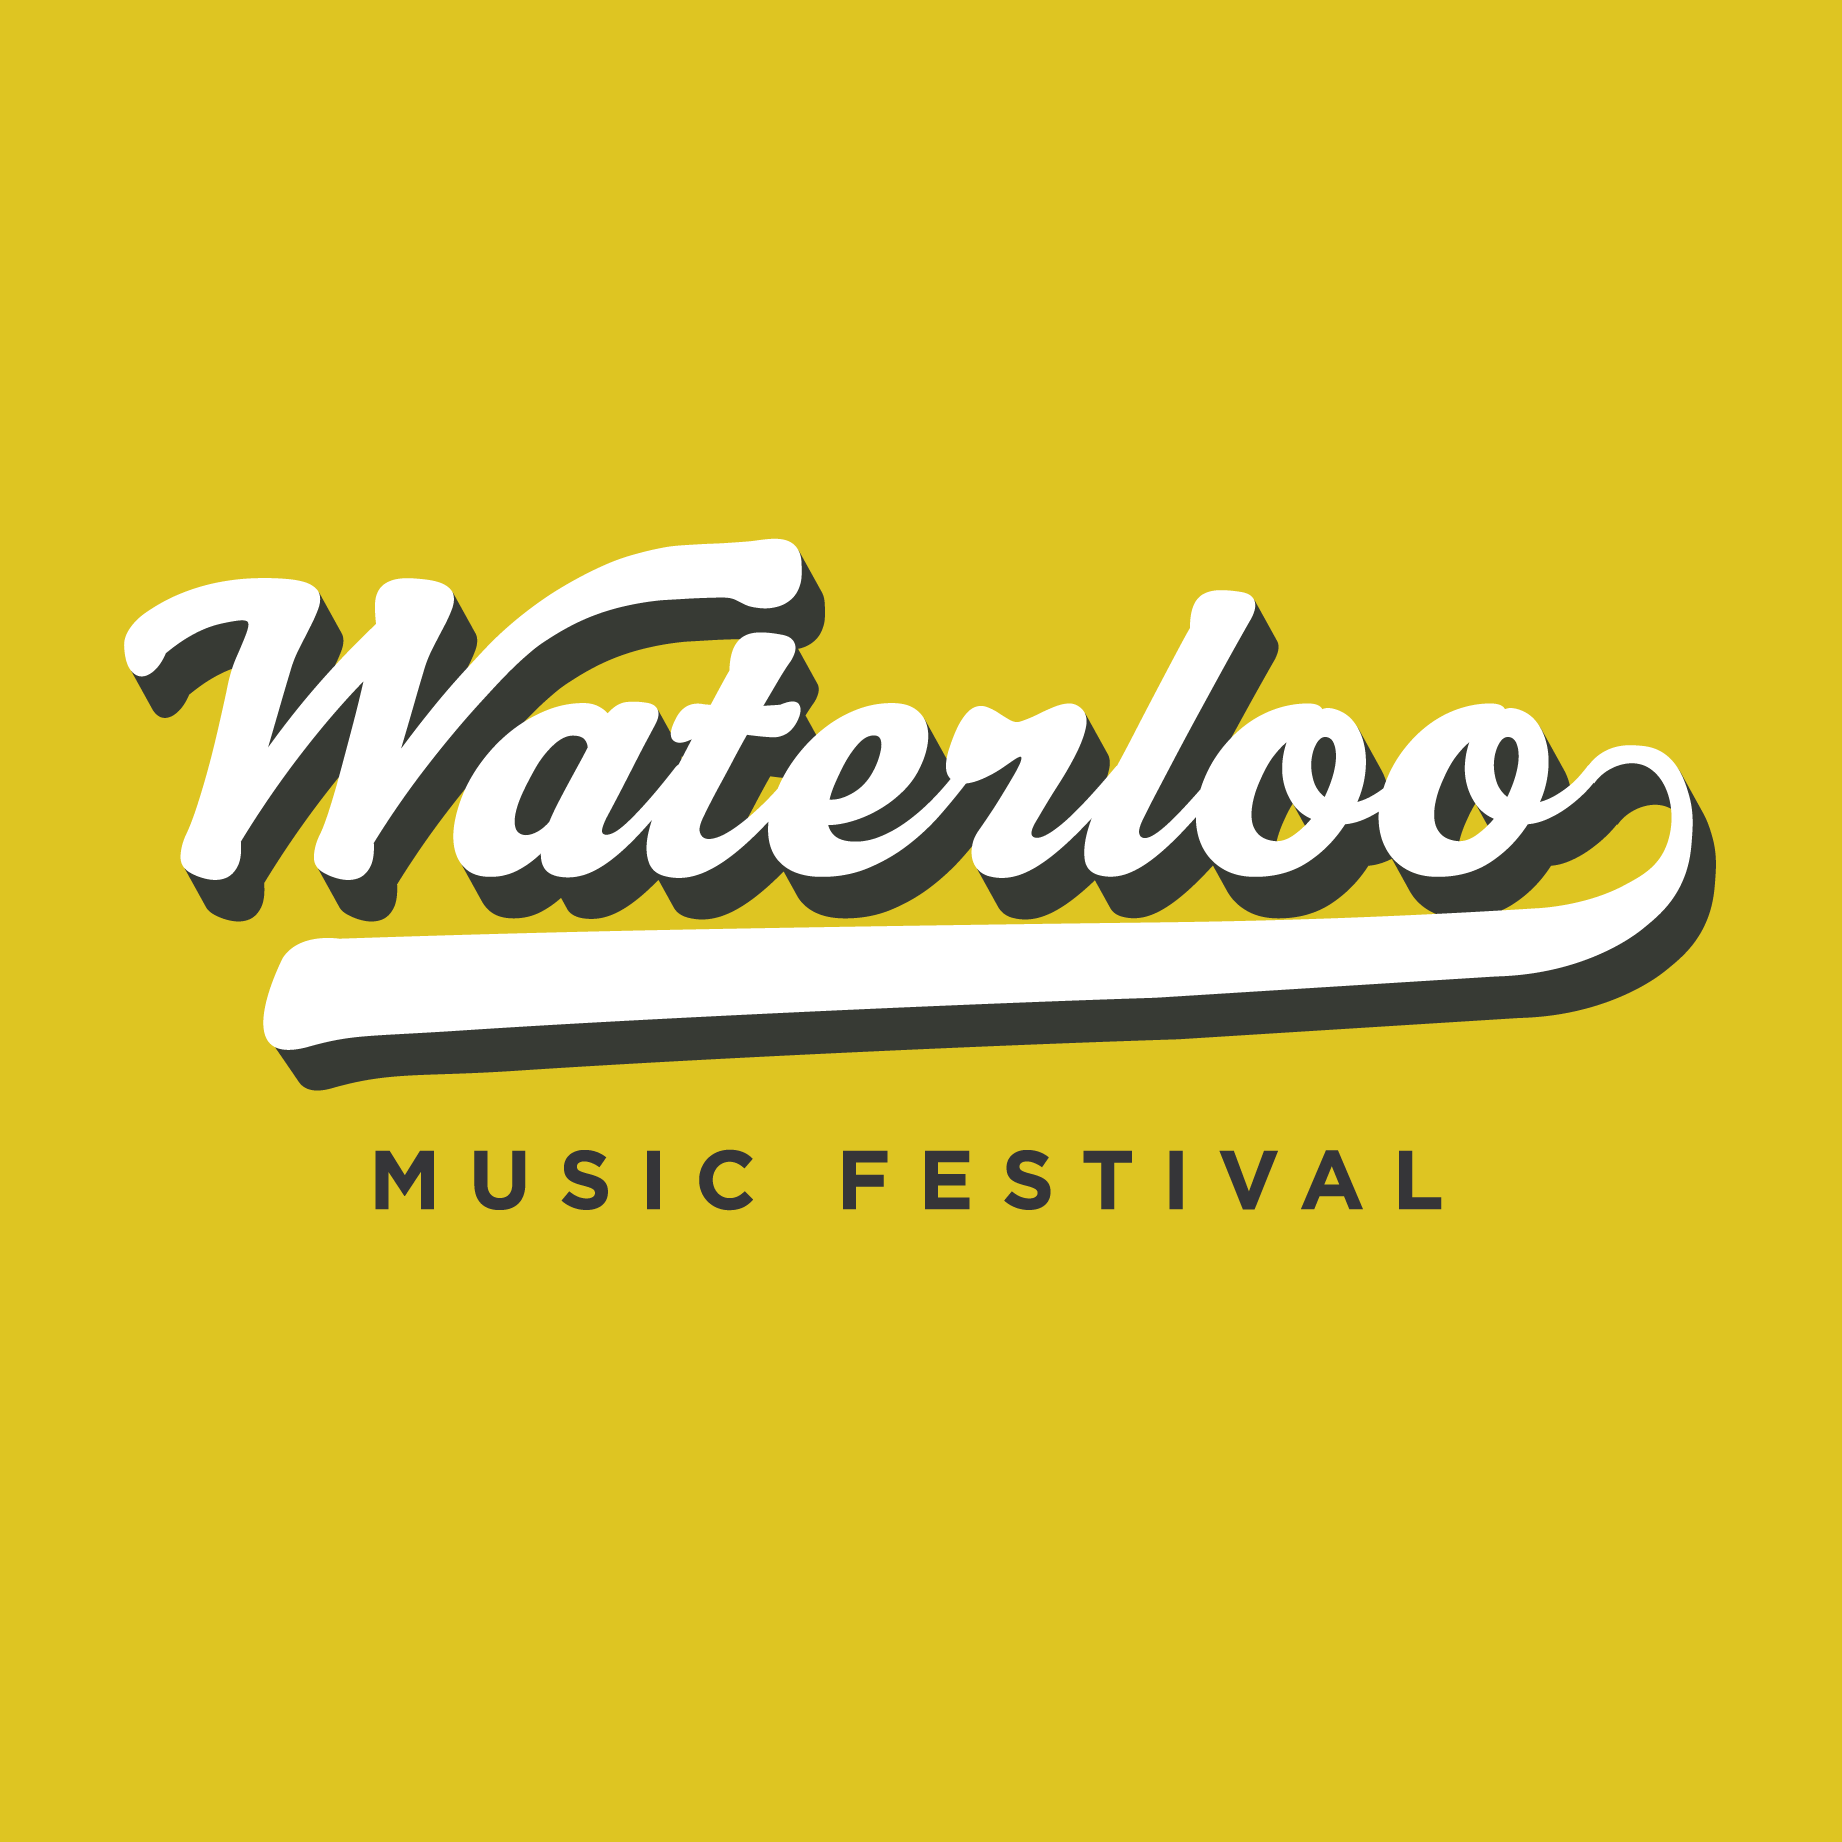 Waterloo Music Festival - Music Festivas in Texas 2020